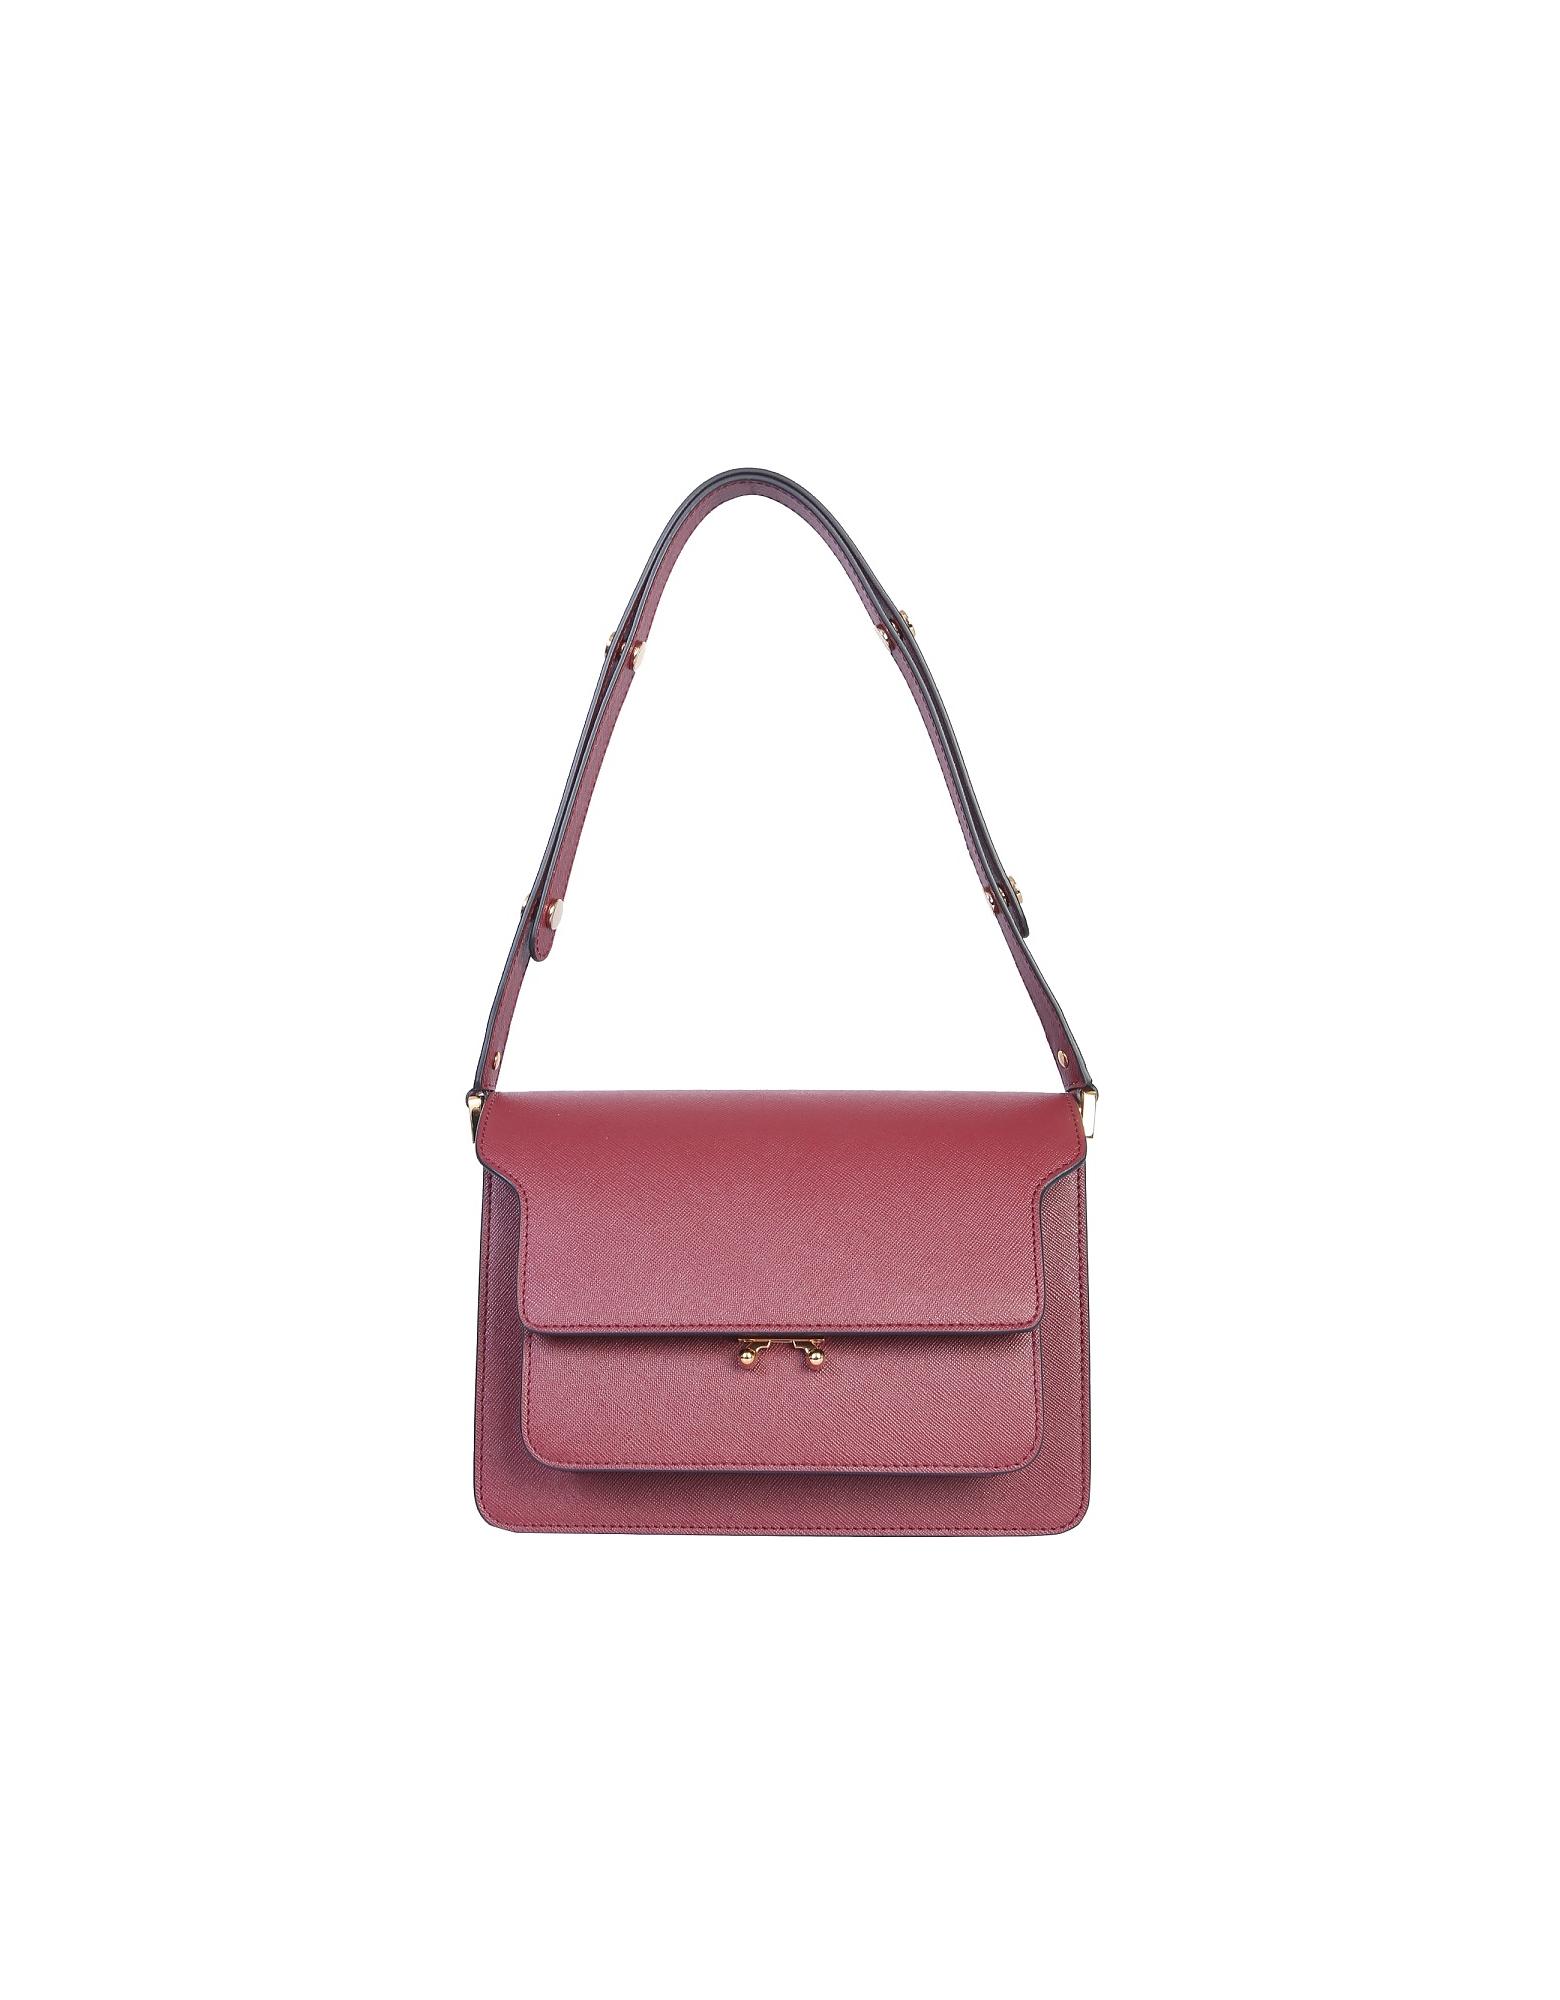 Marni Designer Handbags, Trunk Shoulder Bag